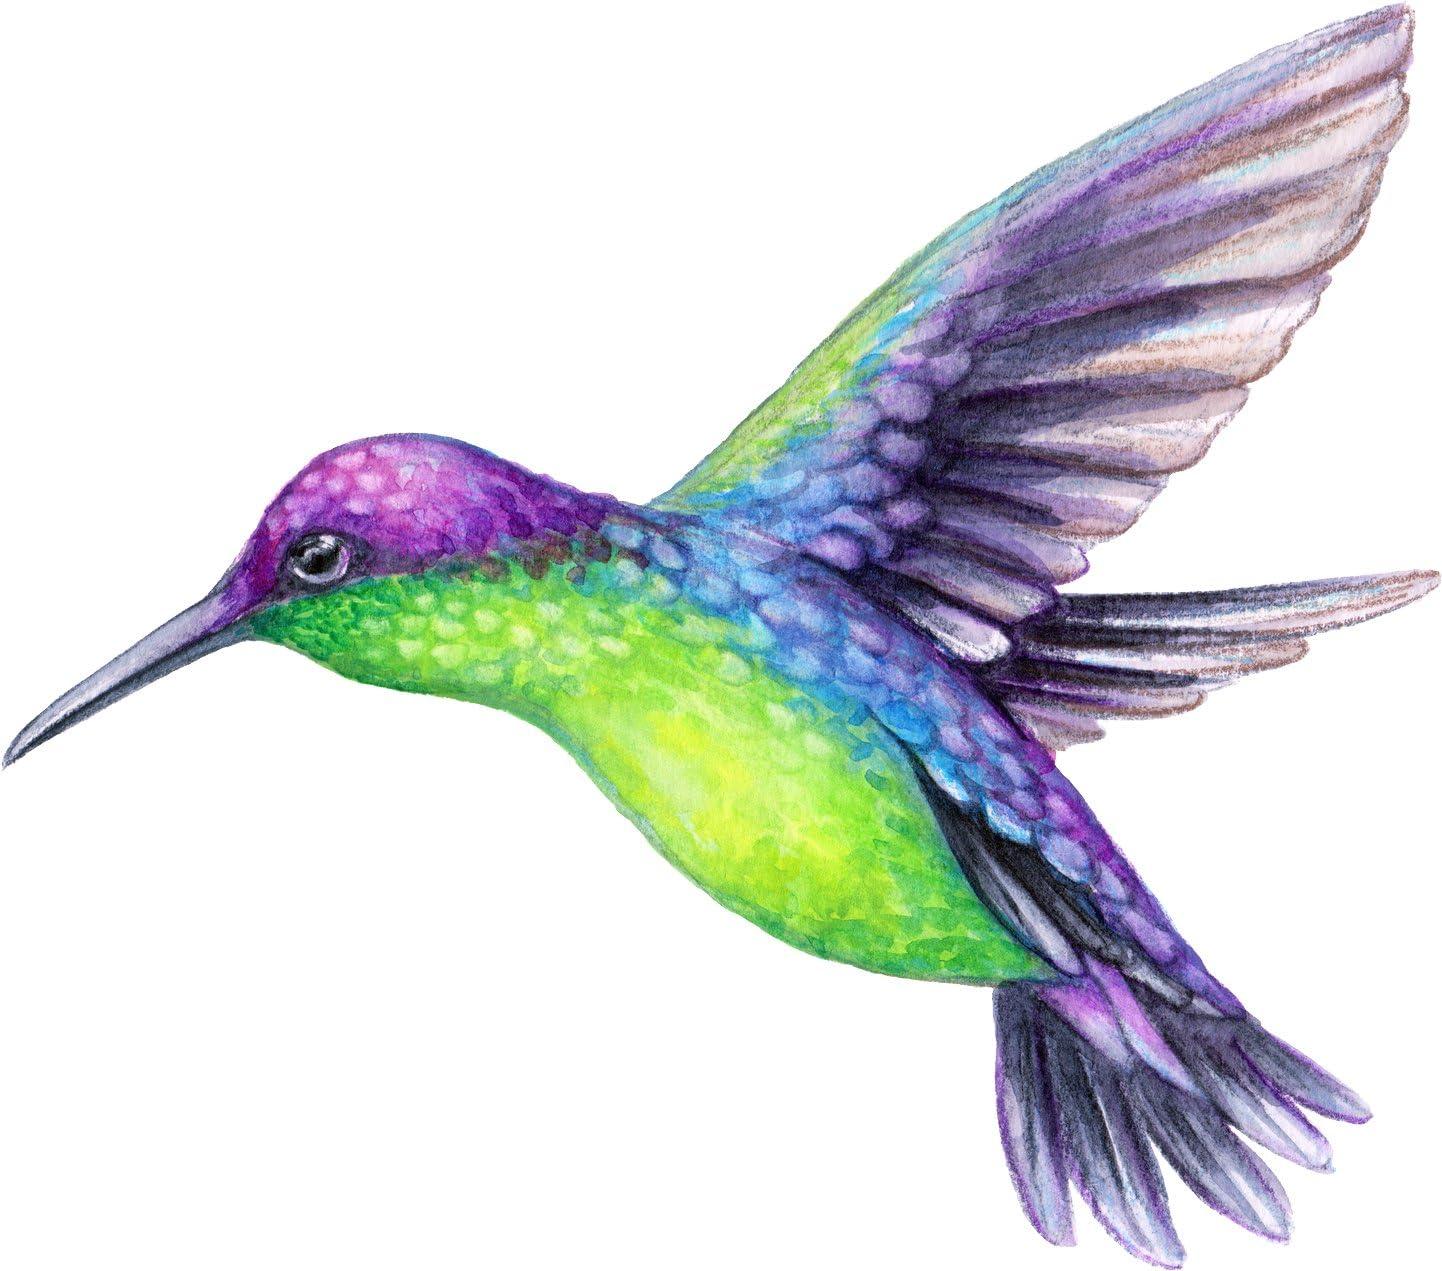 Beautiful Vibrant Colored Hummingbird Art #4 Vinyl Decal Sticker 4 Wide